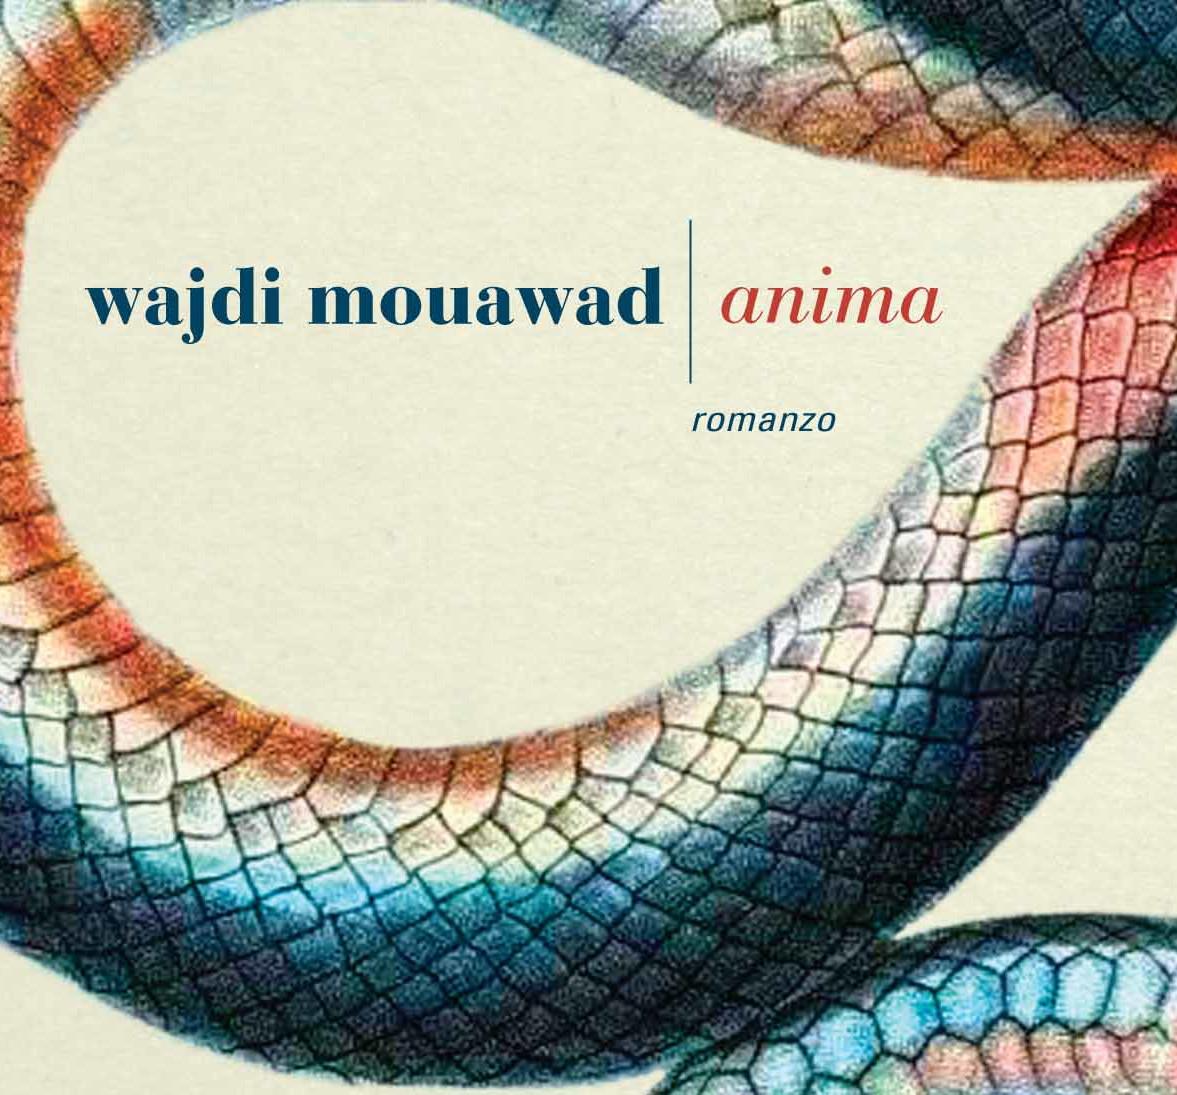 Anima — Wajdi Mouawad